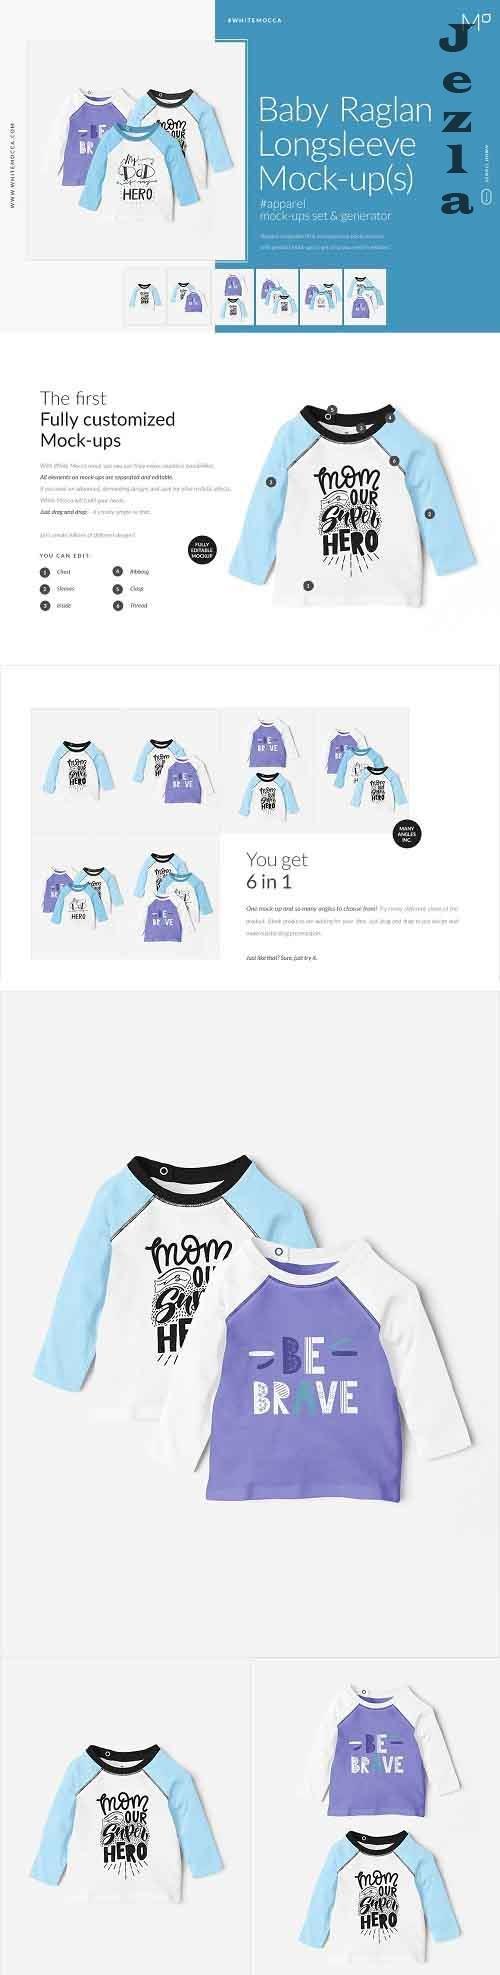 CreativeMarket - Baby Raglan Longsleeve Mock-ups Set 4548234